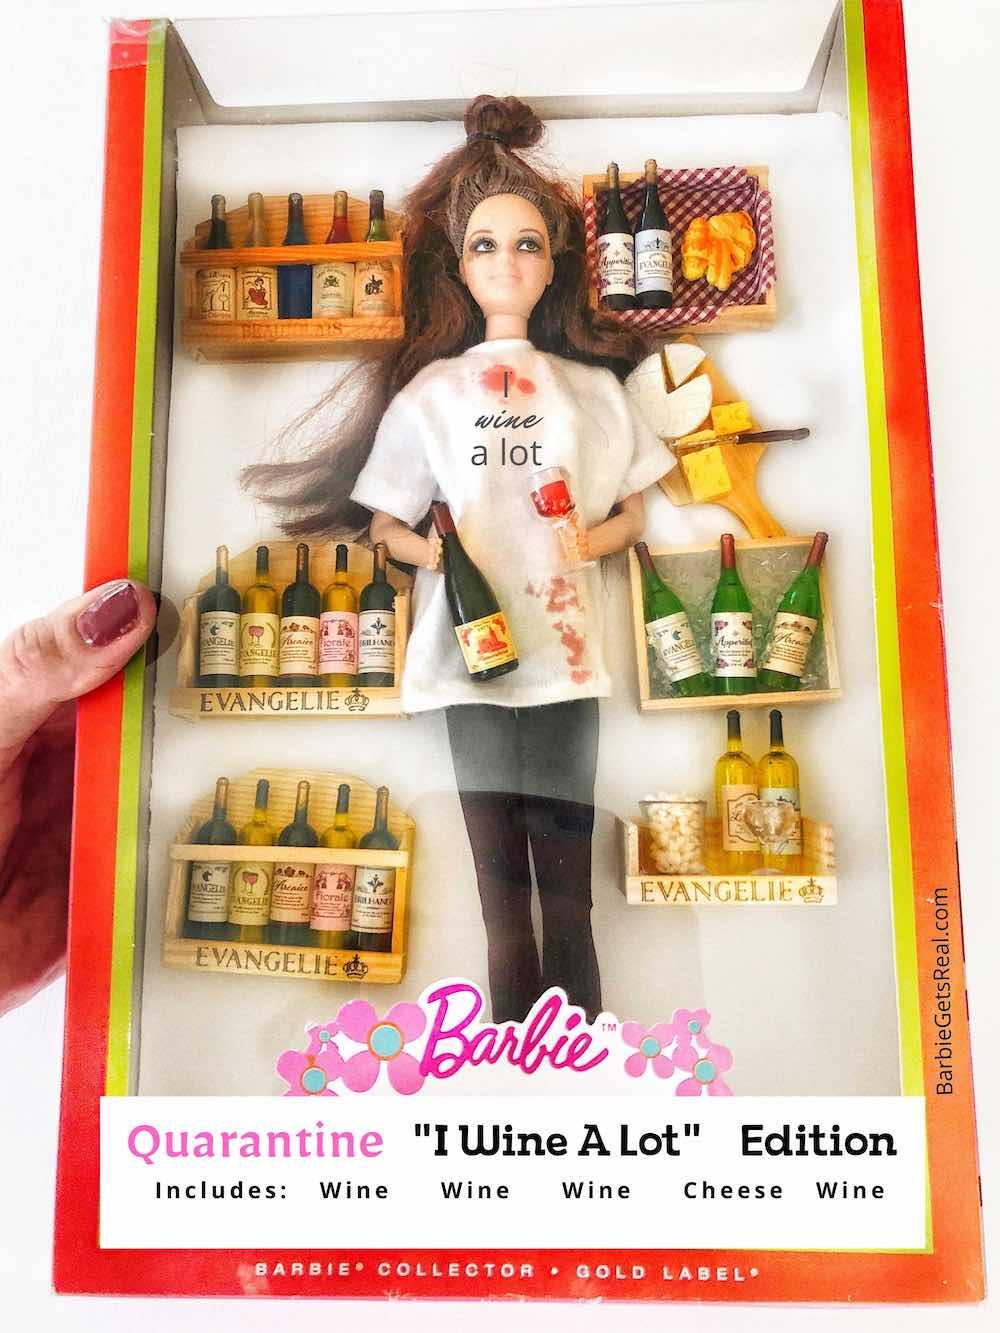 Me Vs You Barbie